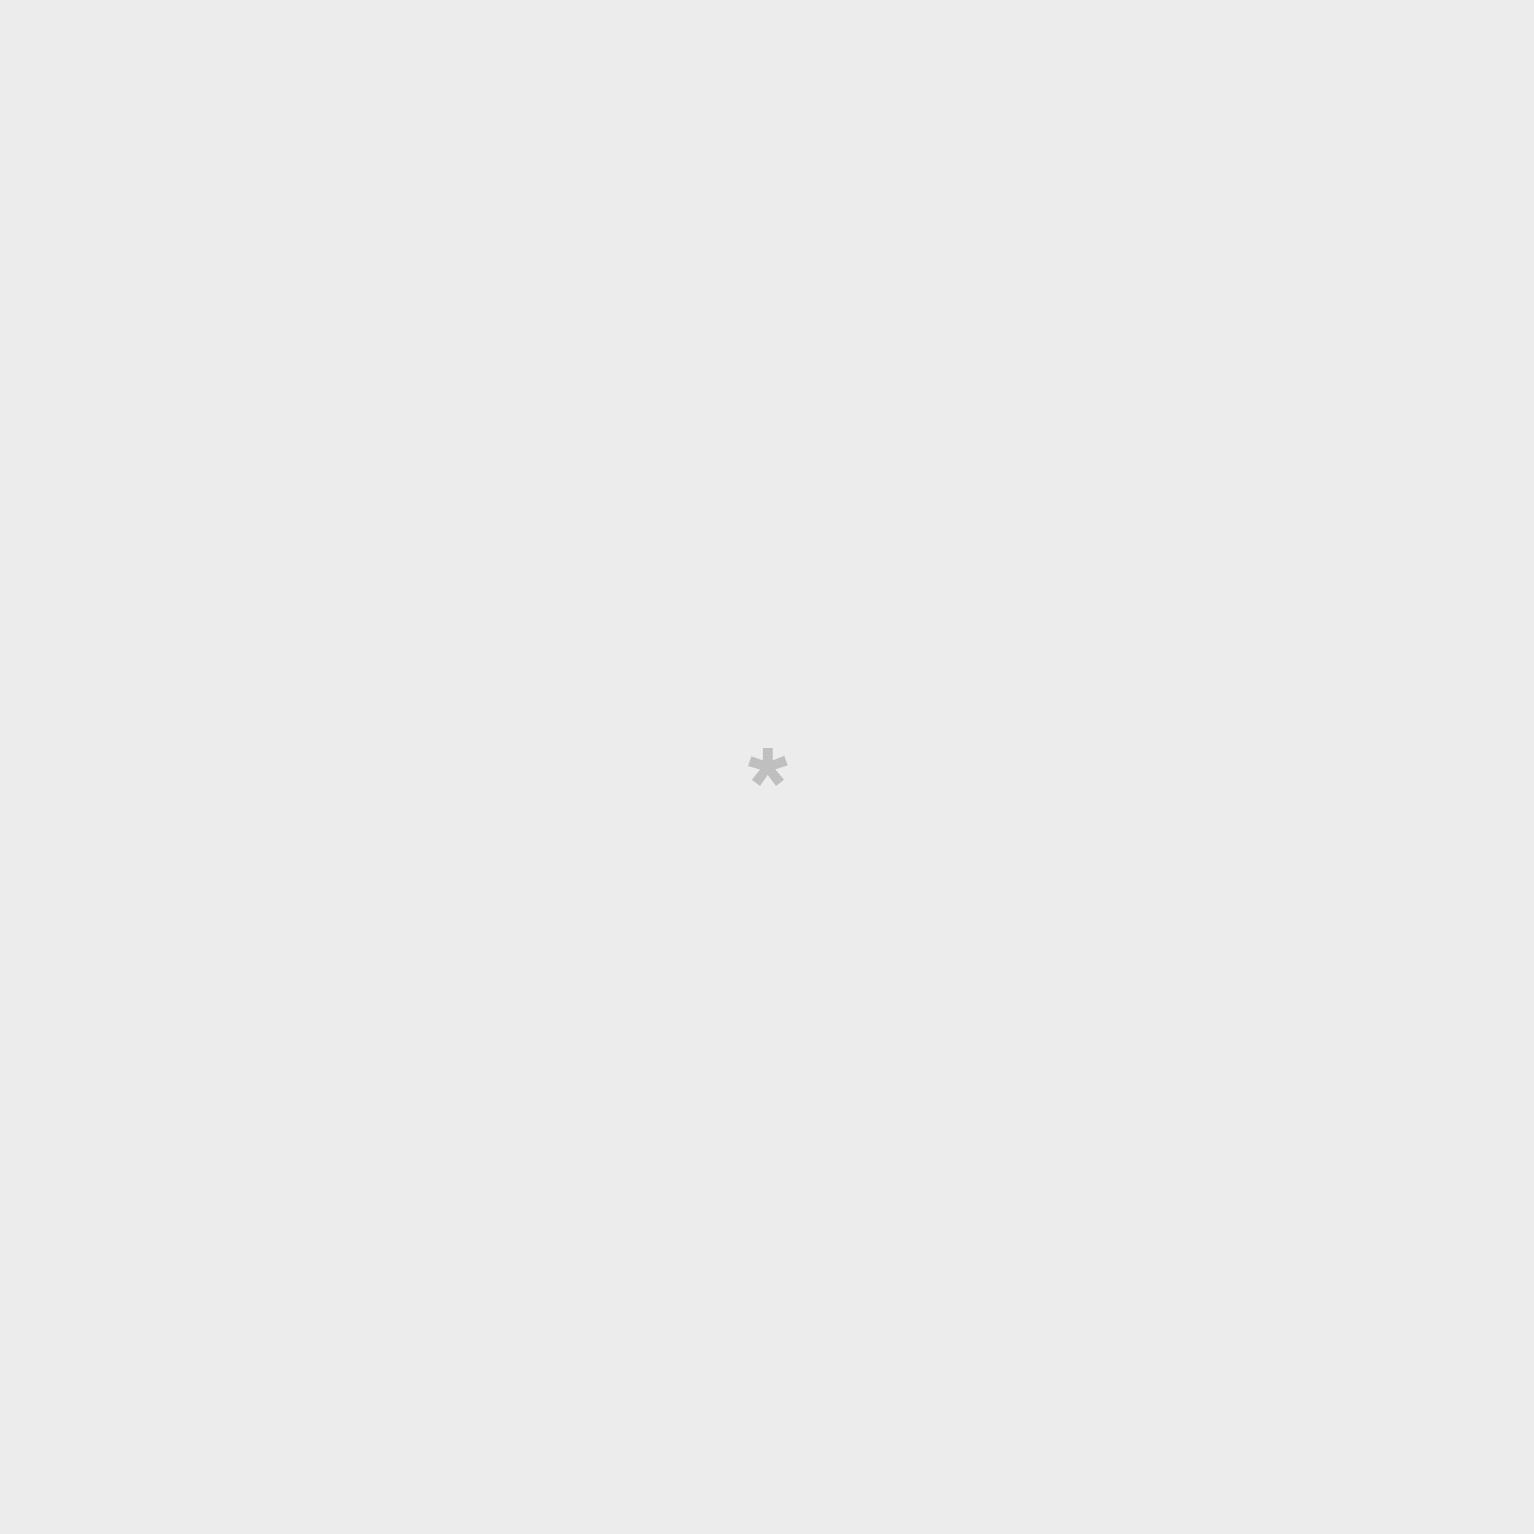 Compartment folder - I'm killing it